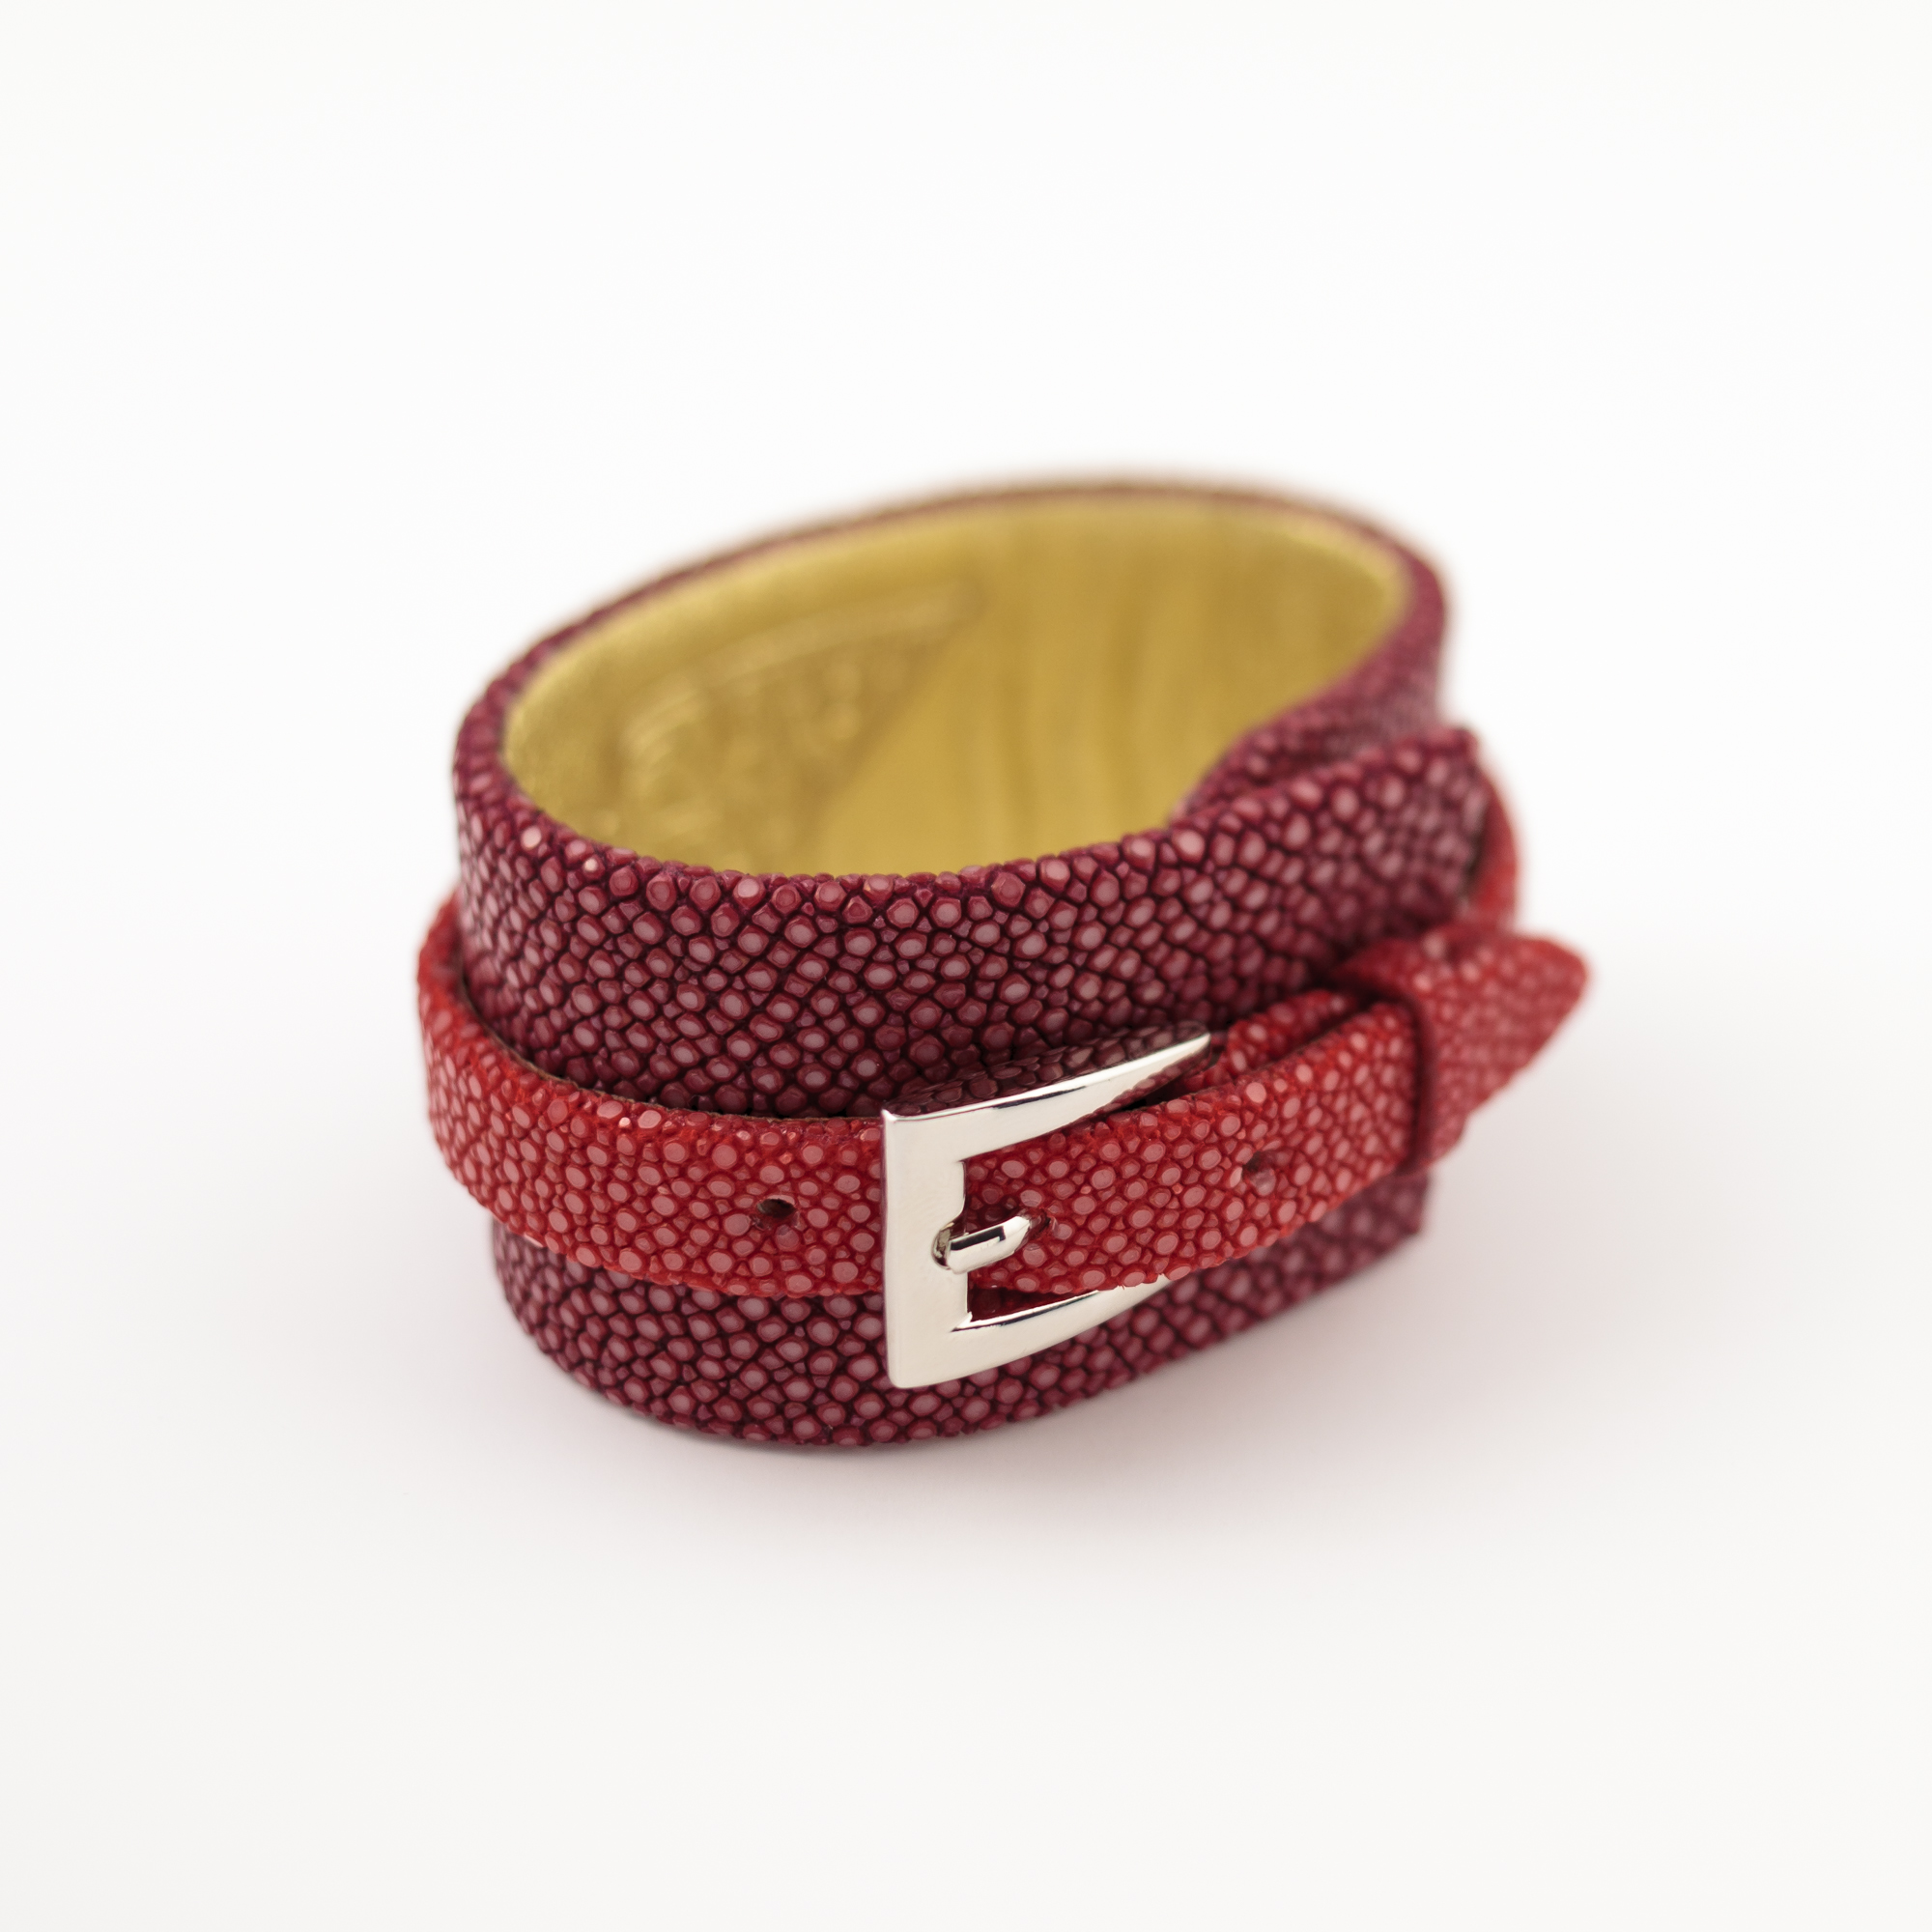 tresor-by-flore-galuchat-bracelet-etreinte-bordeaux